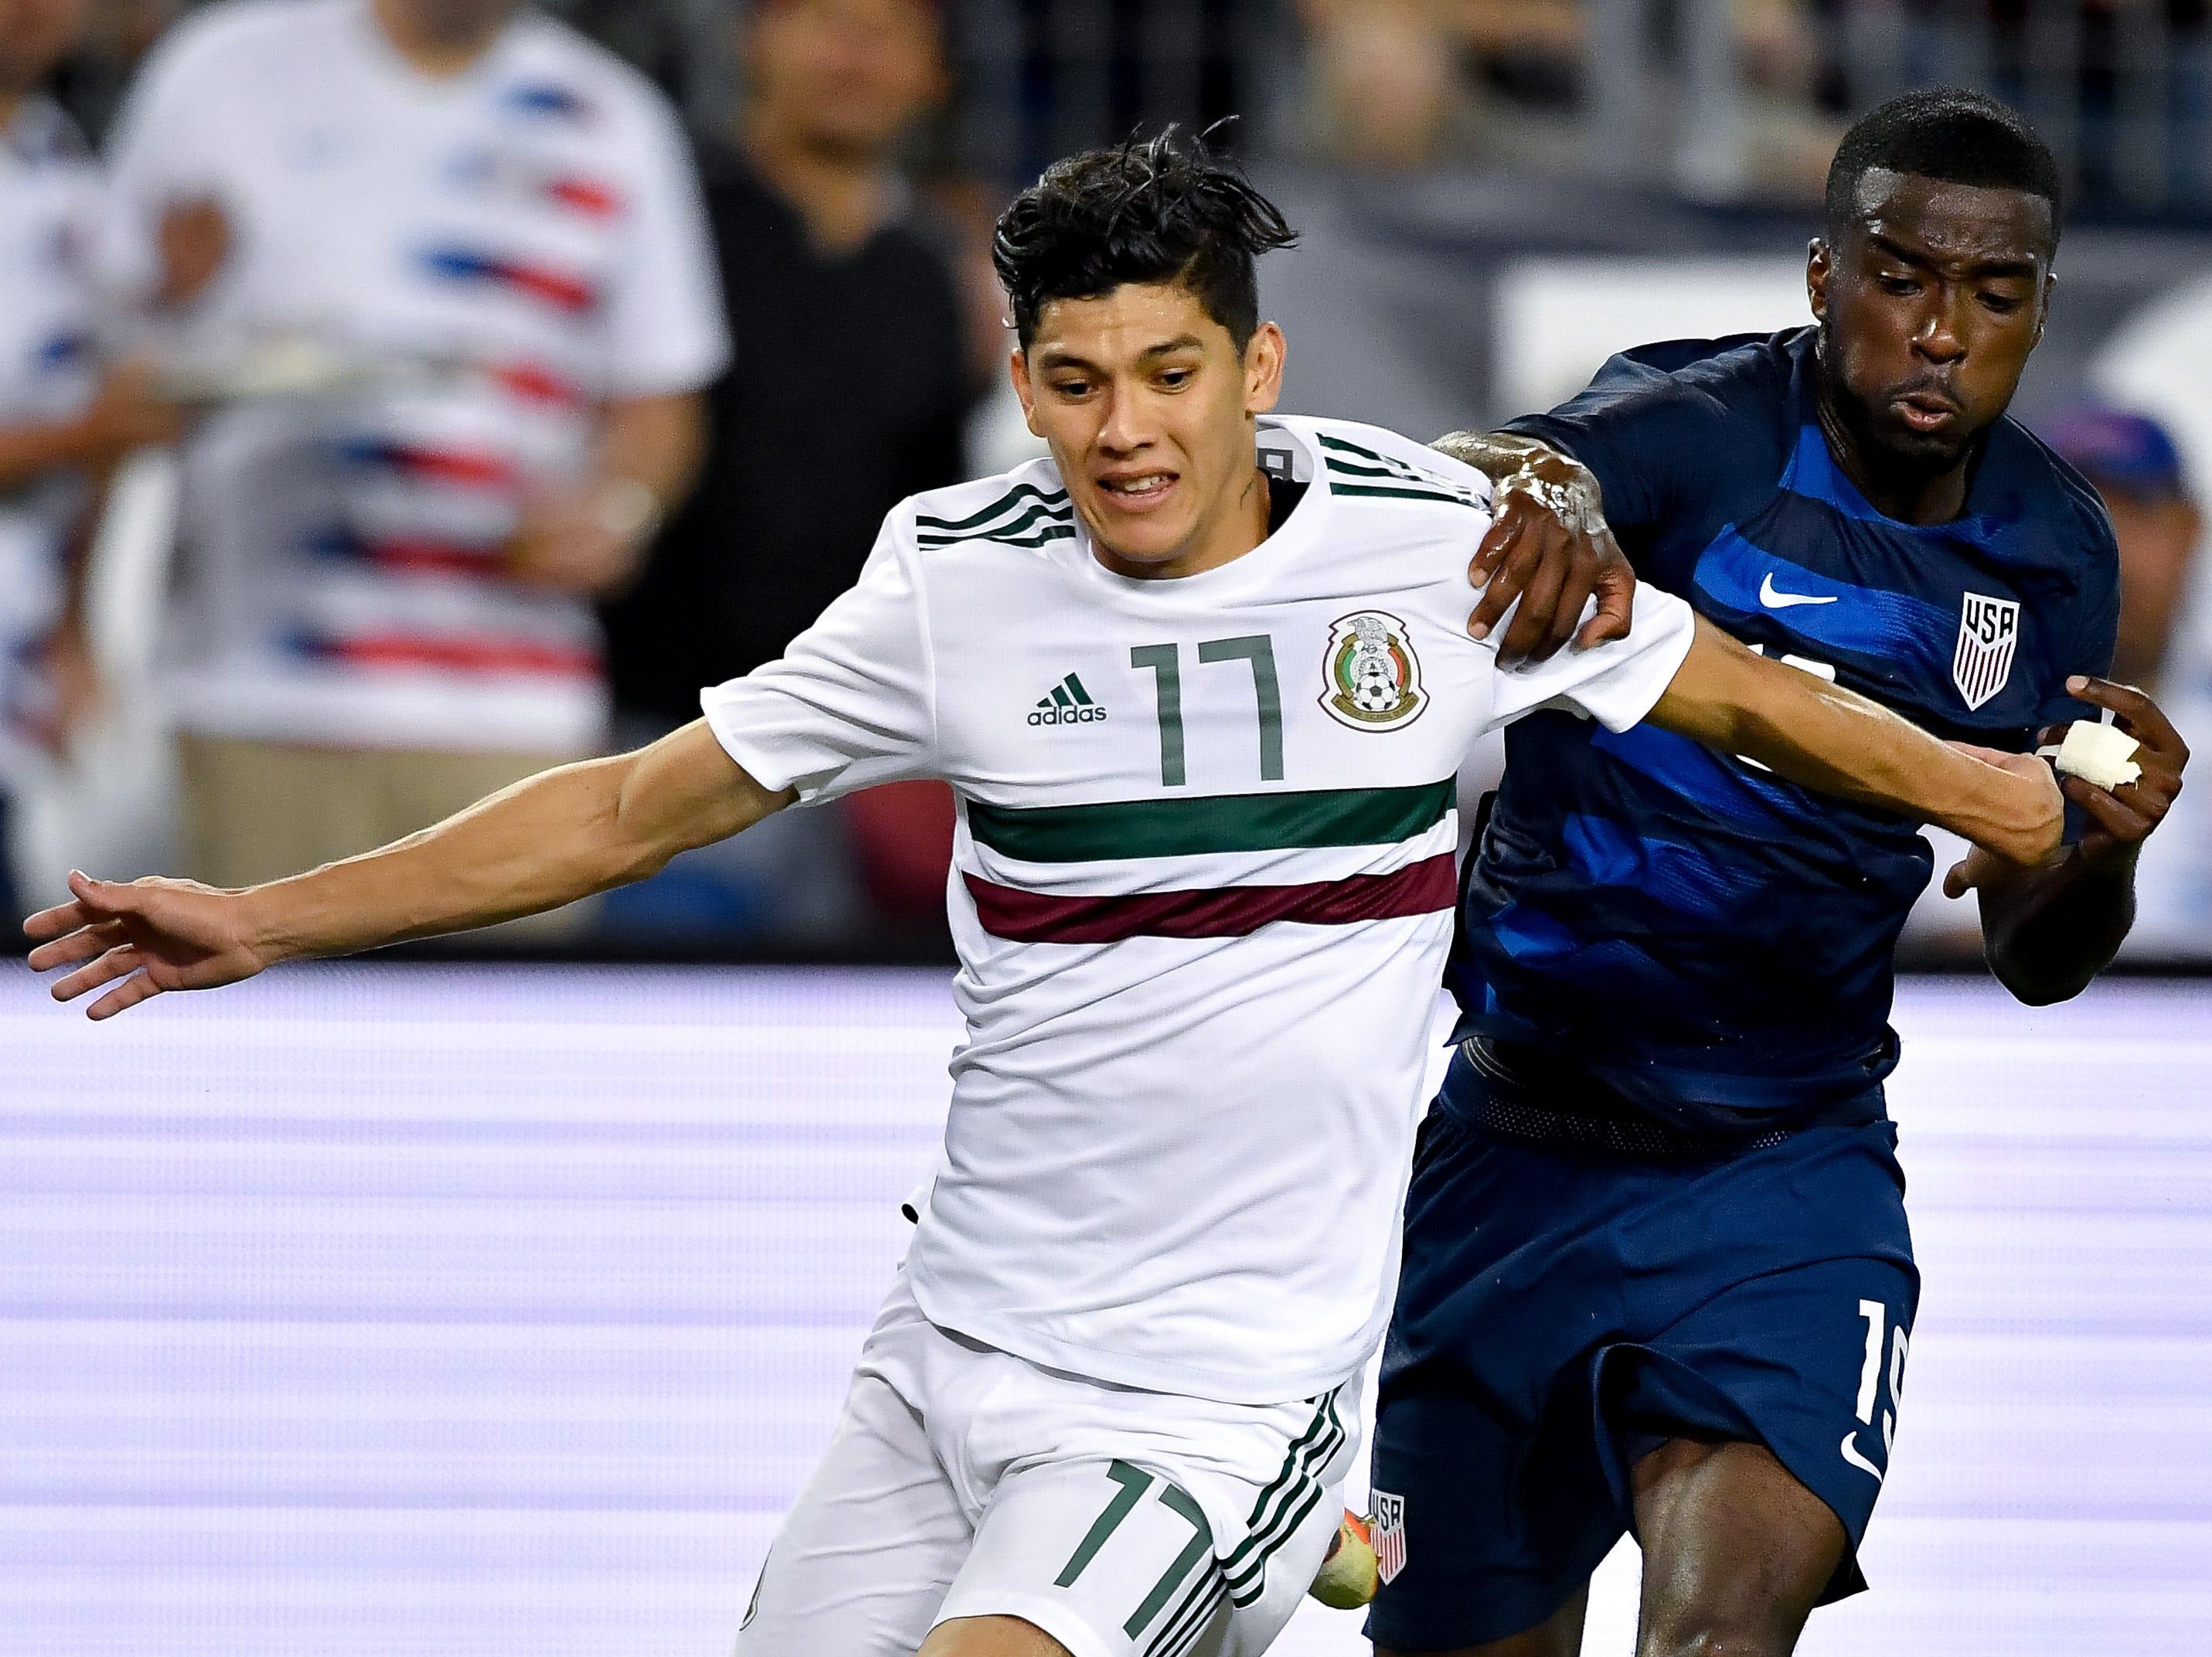 Mexico defender Gerardo Arteaga (17) battles USA defender Shaq Moore (19) during the first half at Nissan Stadium in Nashville, Tenn., Tuesday, Sept. 11, 2018.